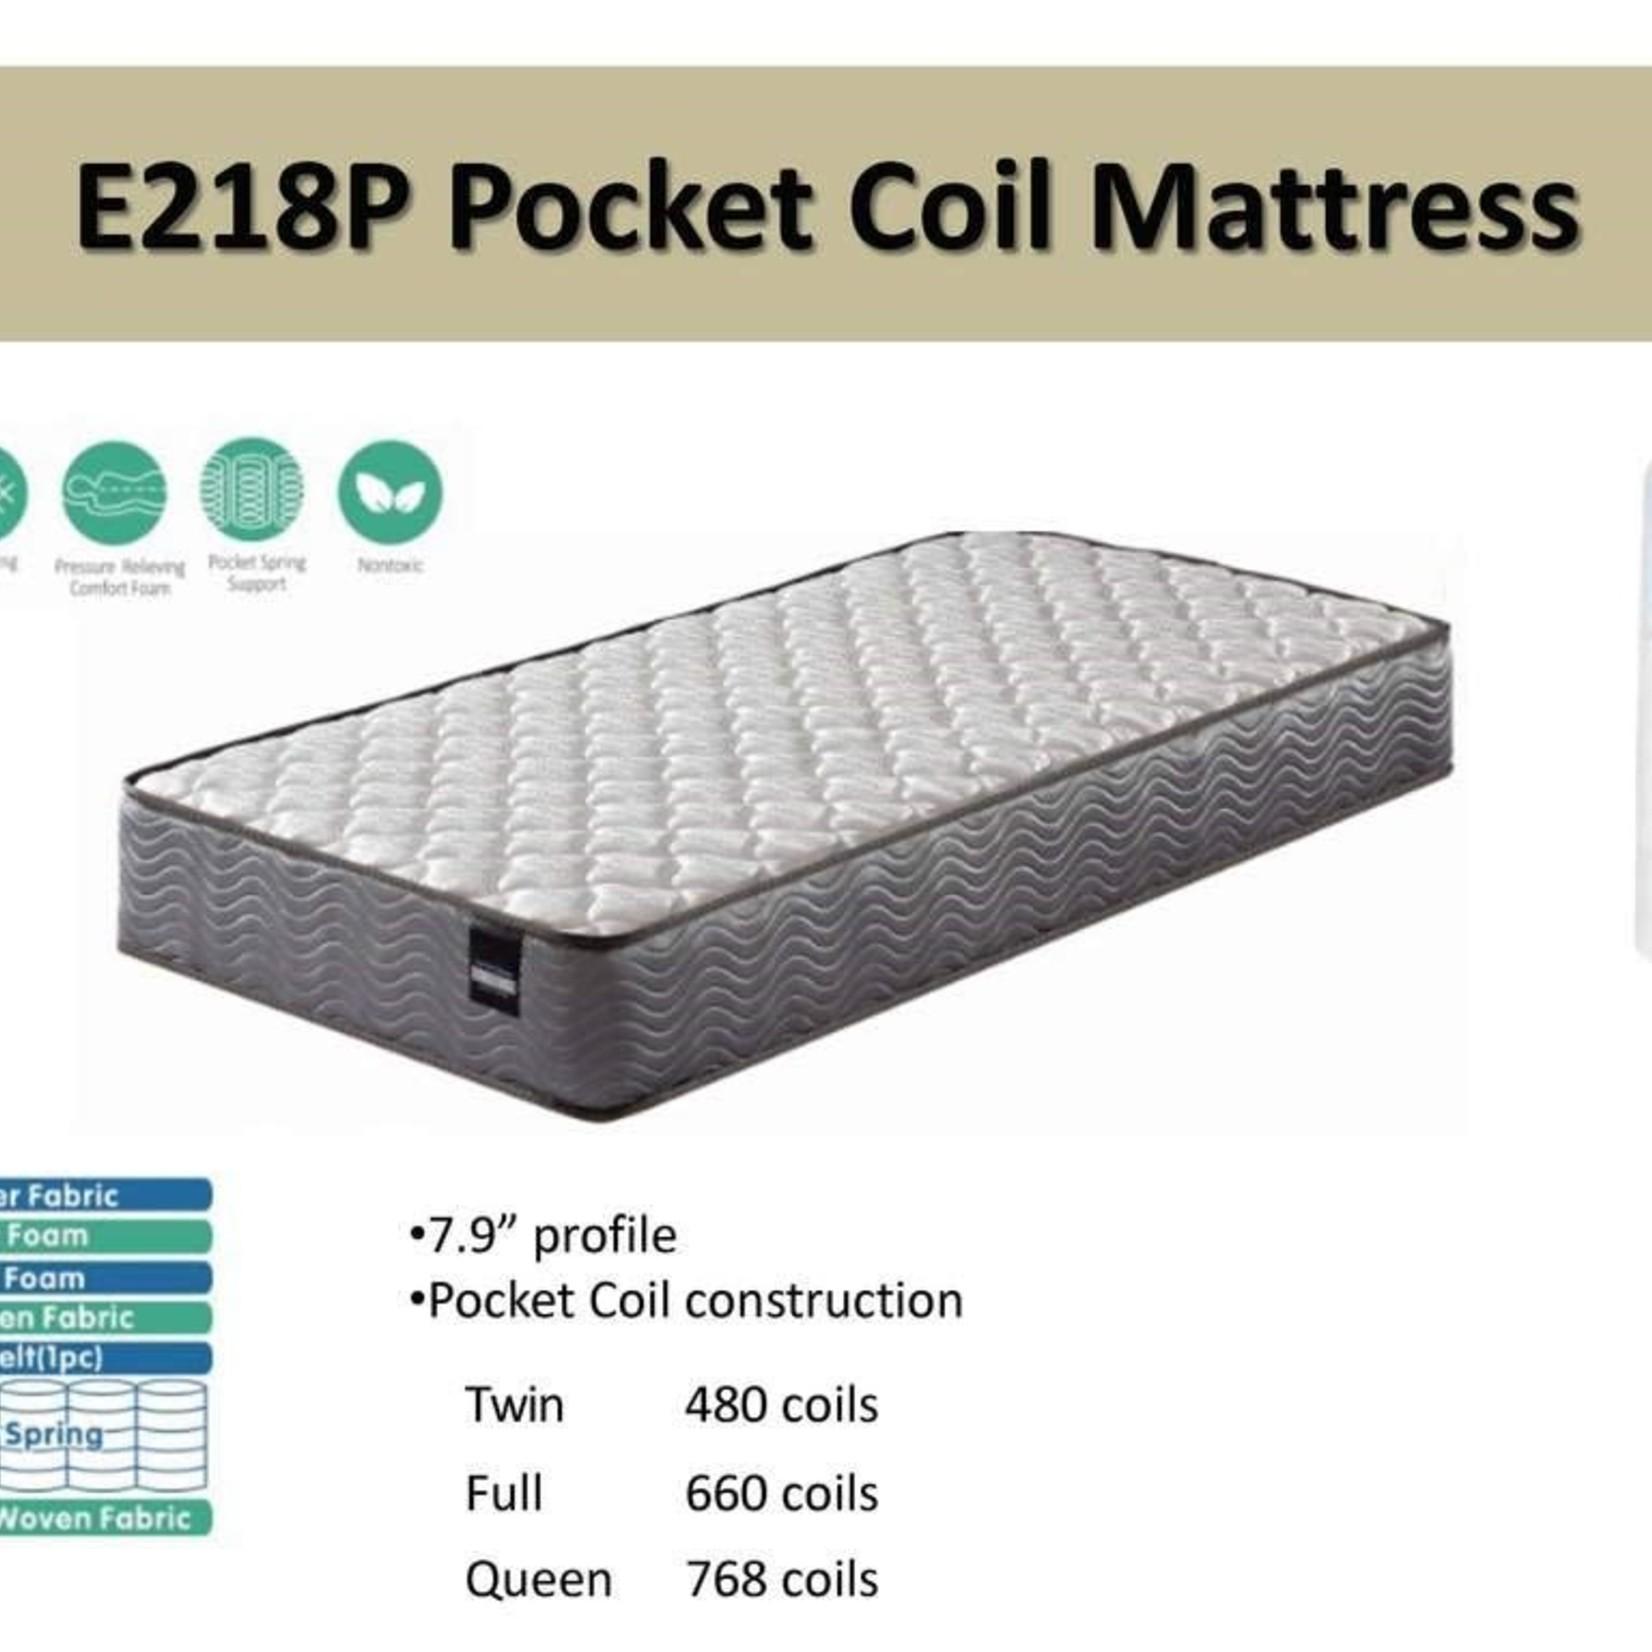 E218P Pocket Coil Queen Matress